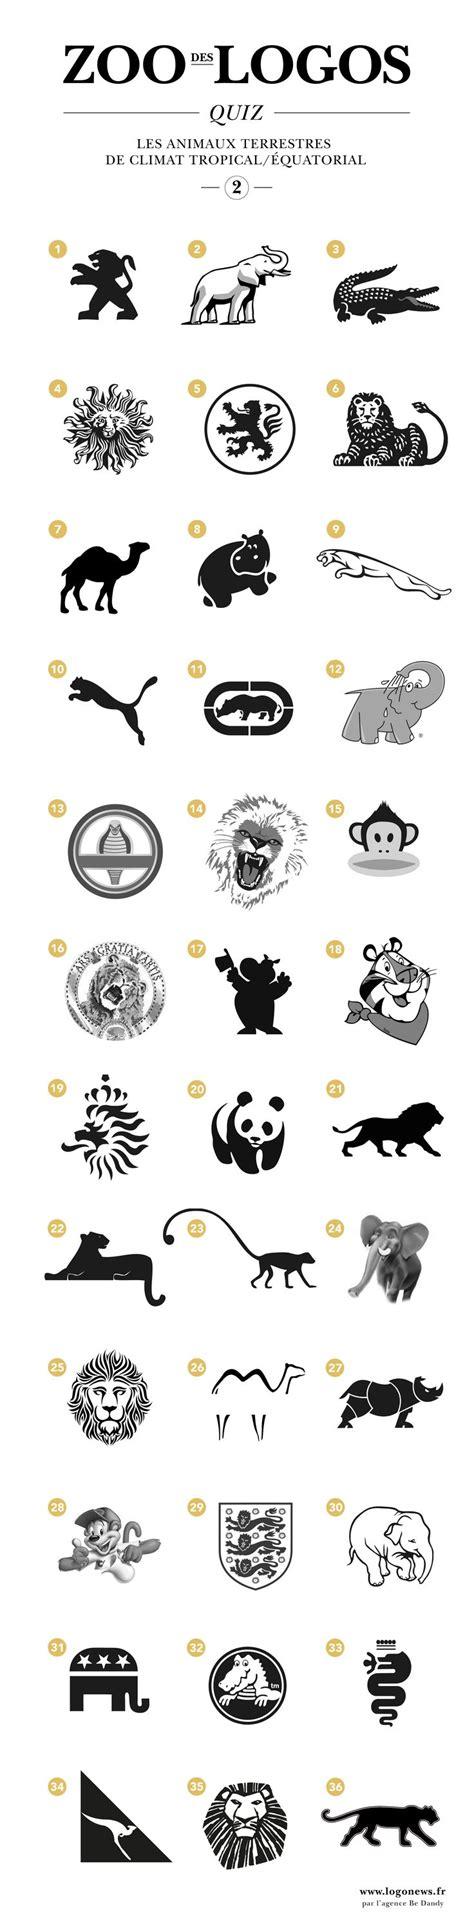 quiz design inspiration quiz le zoo des logos 2 design och inspiration